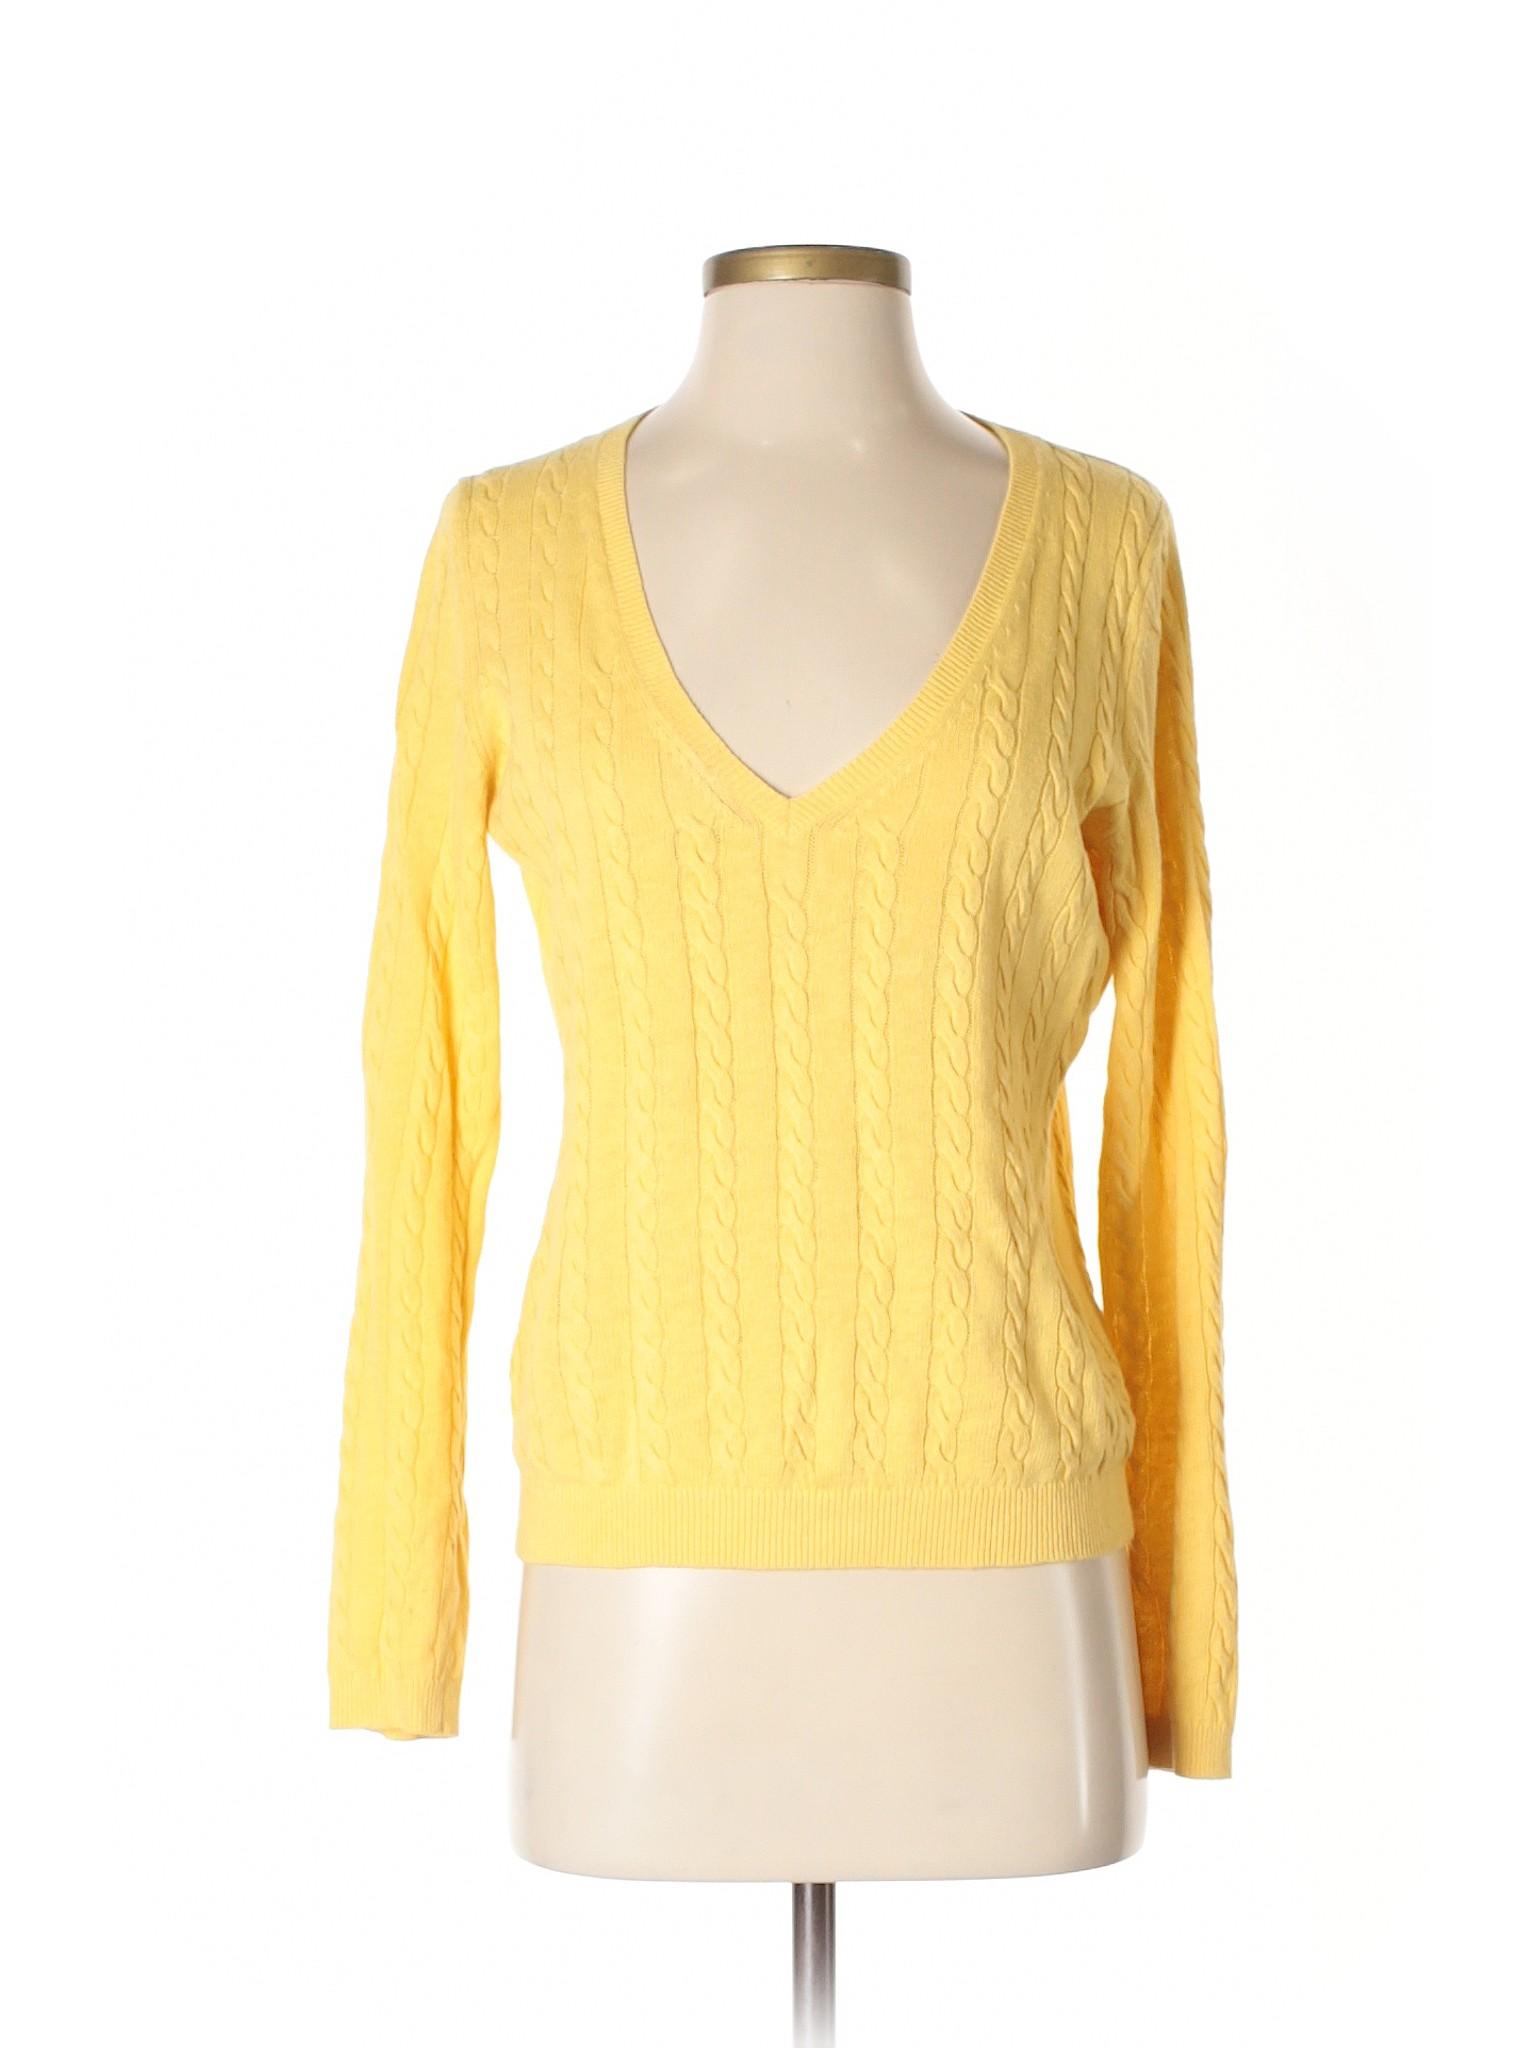 Pullover Boutique Boutique Sweater Ann Ann Taylor wIZ1q8Hg